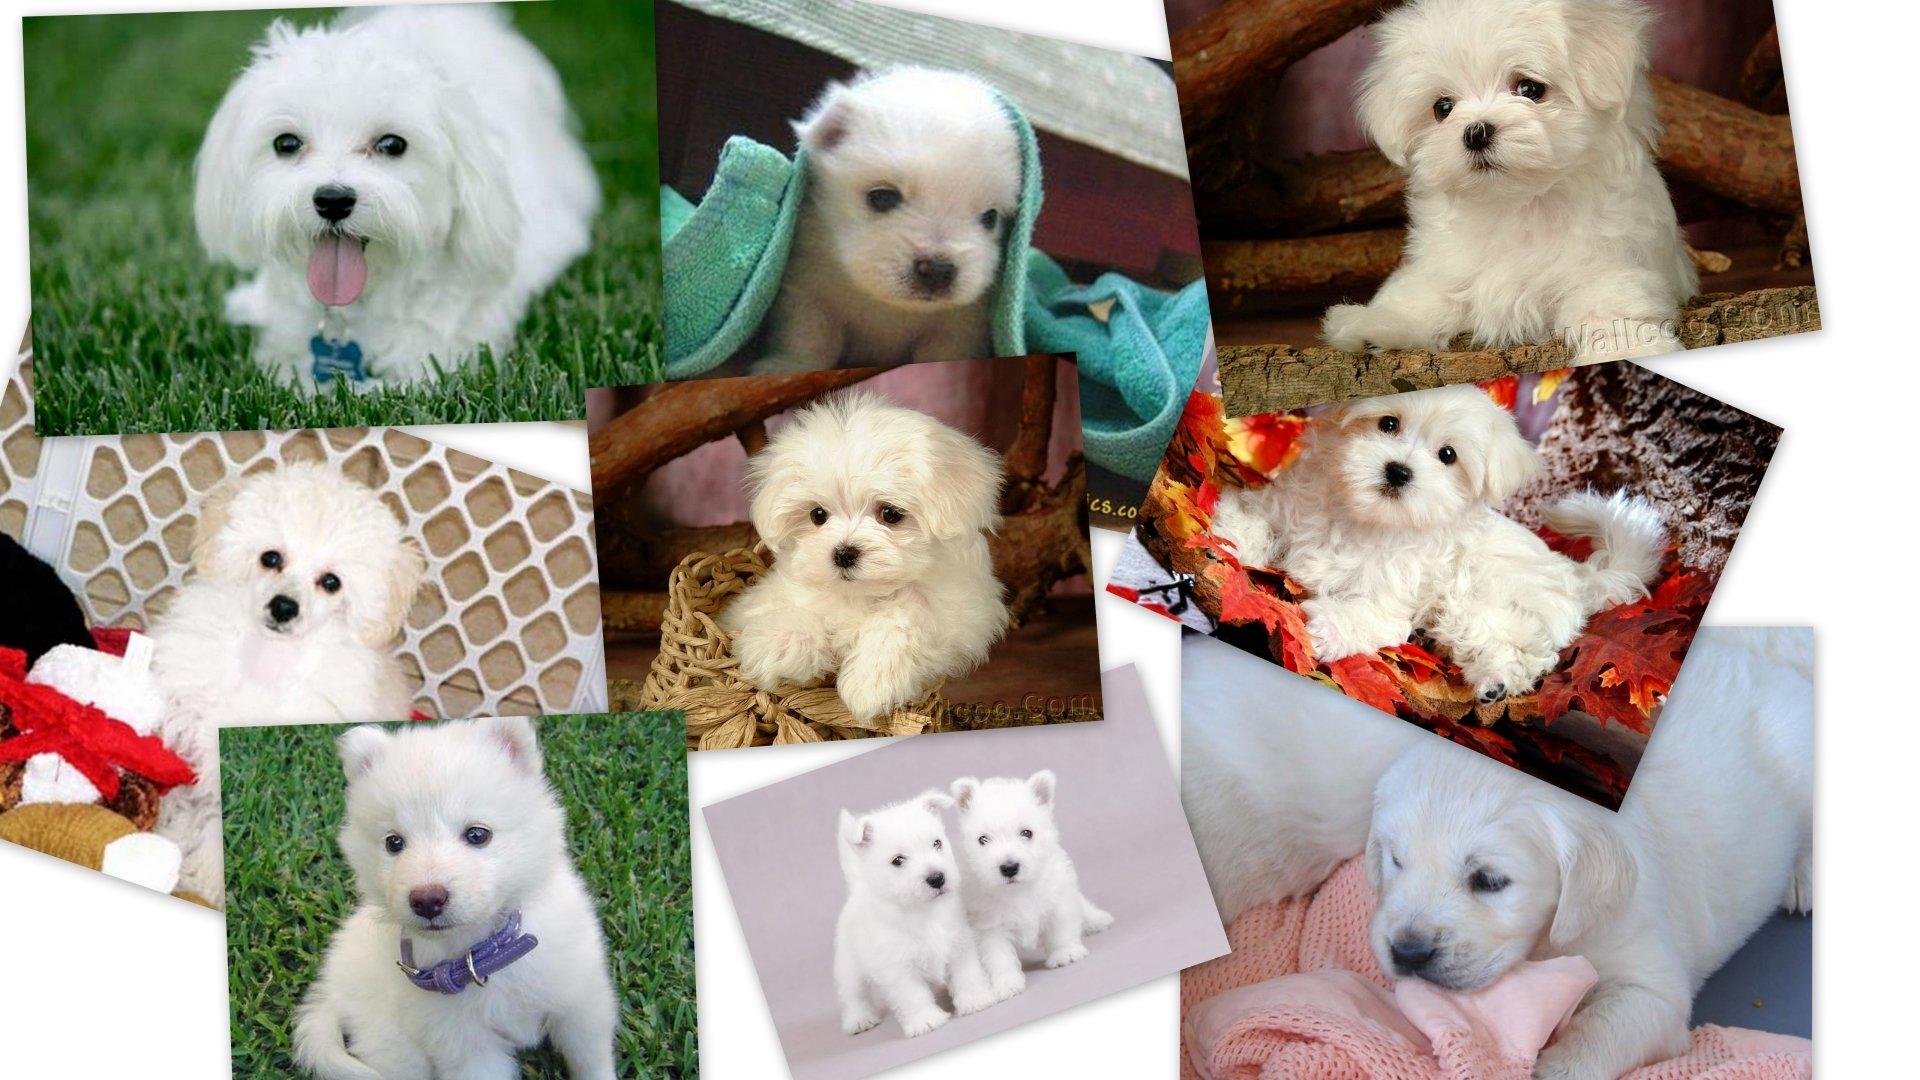 Animal - Dog  Wallpaper